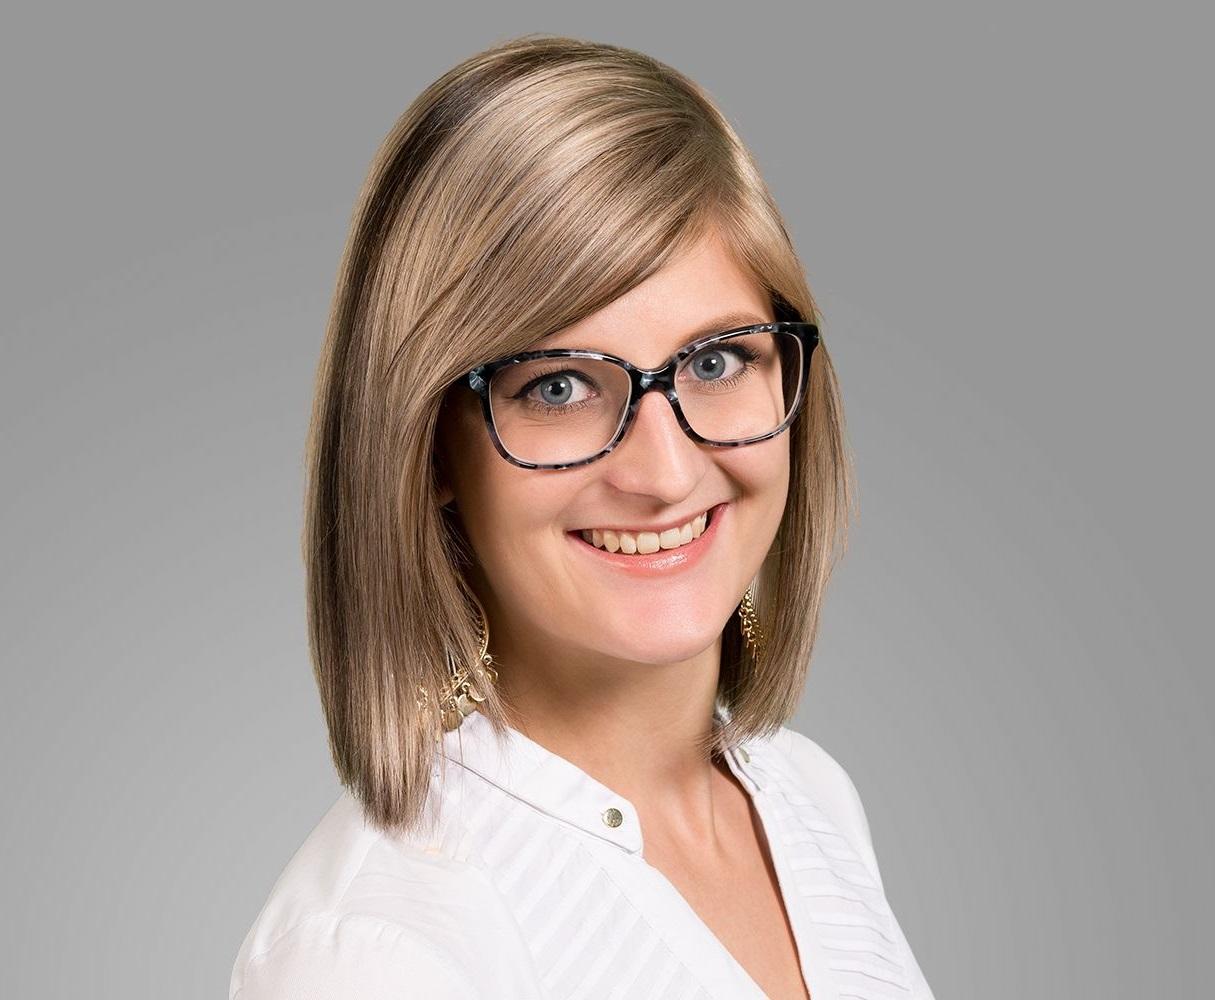 Nina Friesenbichler